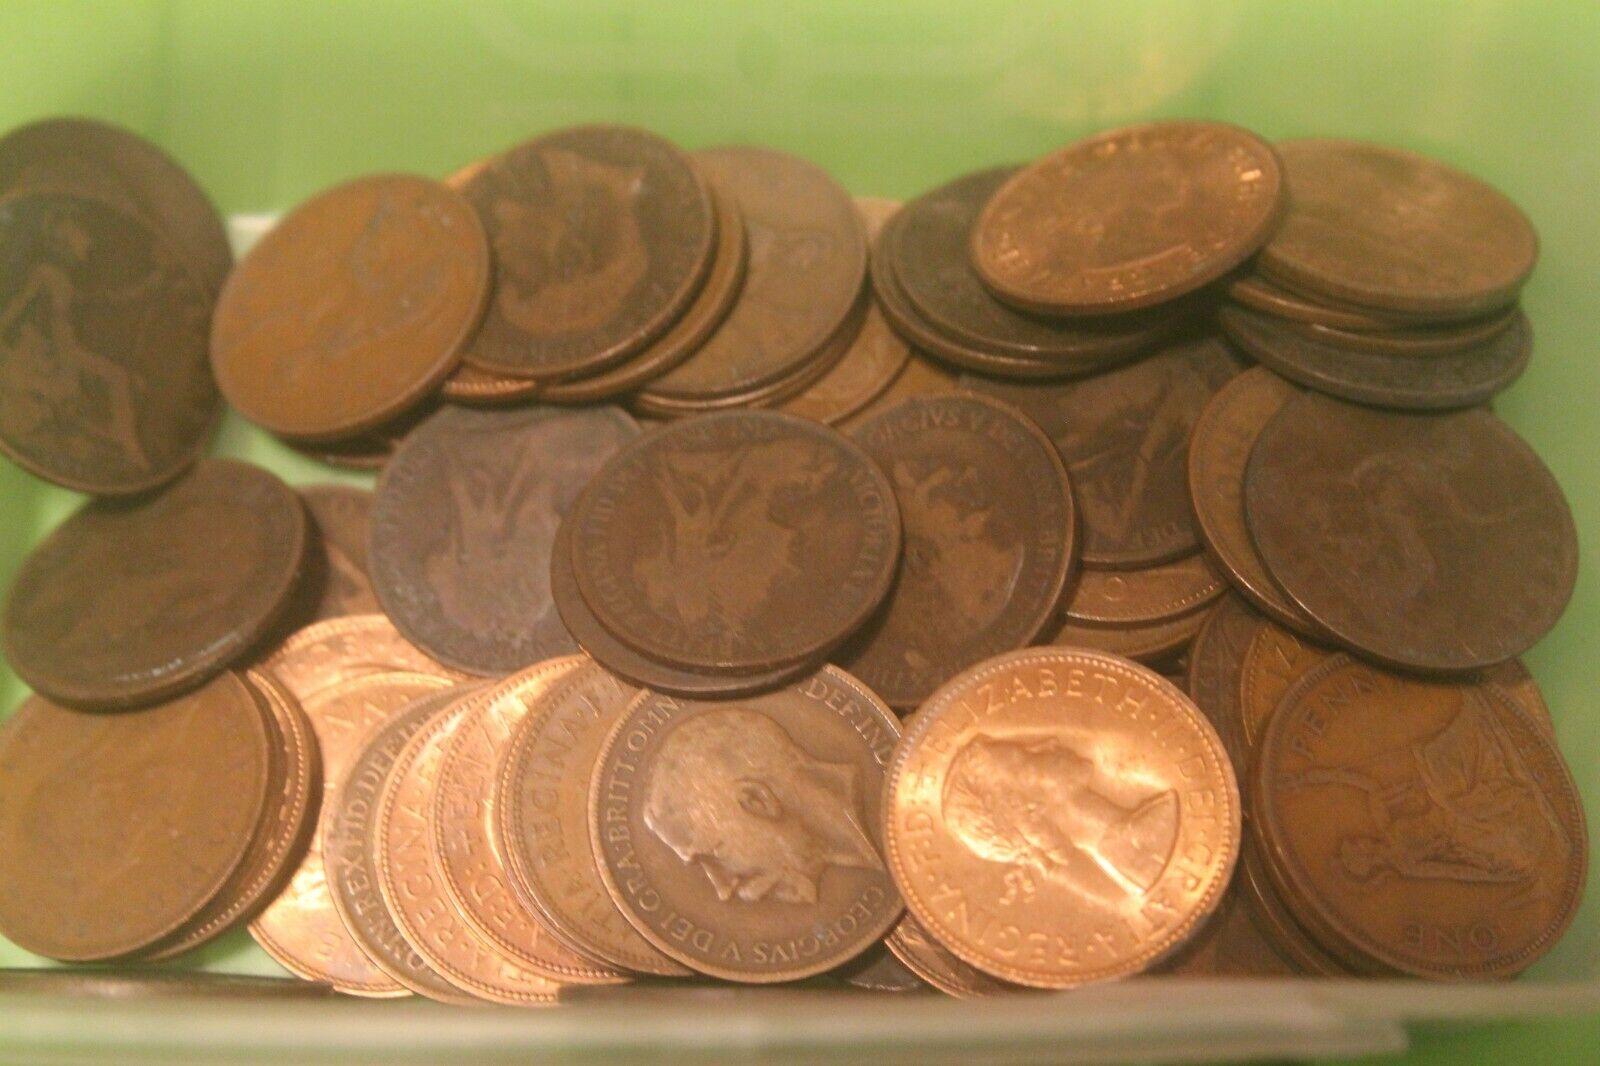 50 x 1d old penny allwin arcade / fruit machine coins